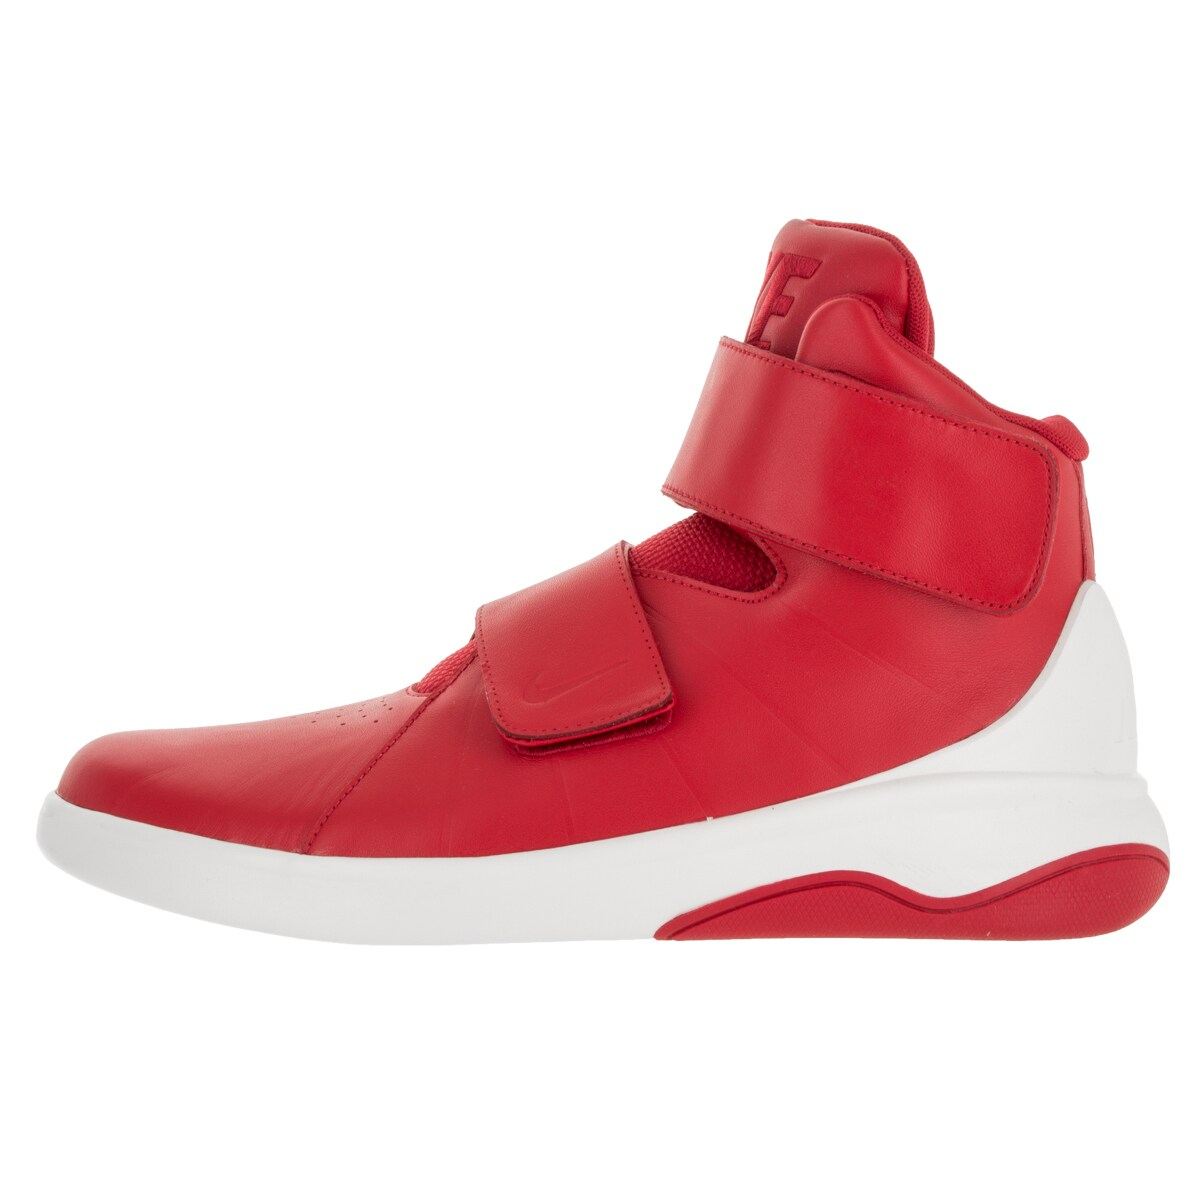 designer fashion da02a a3898 Shop Nike Mens Marxman University RedUniversity RedBlack Casual Shoe -  Free Shipping Today - Overstock.com - 12328562